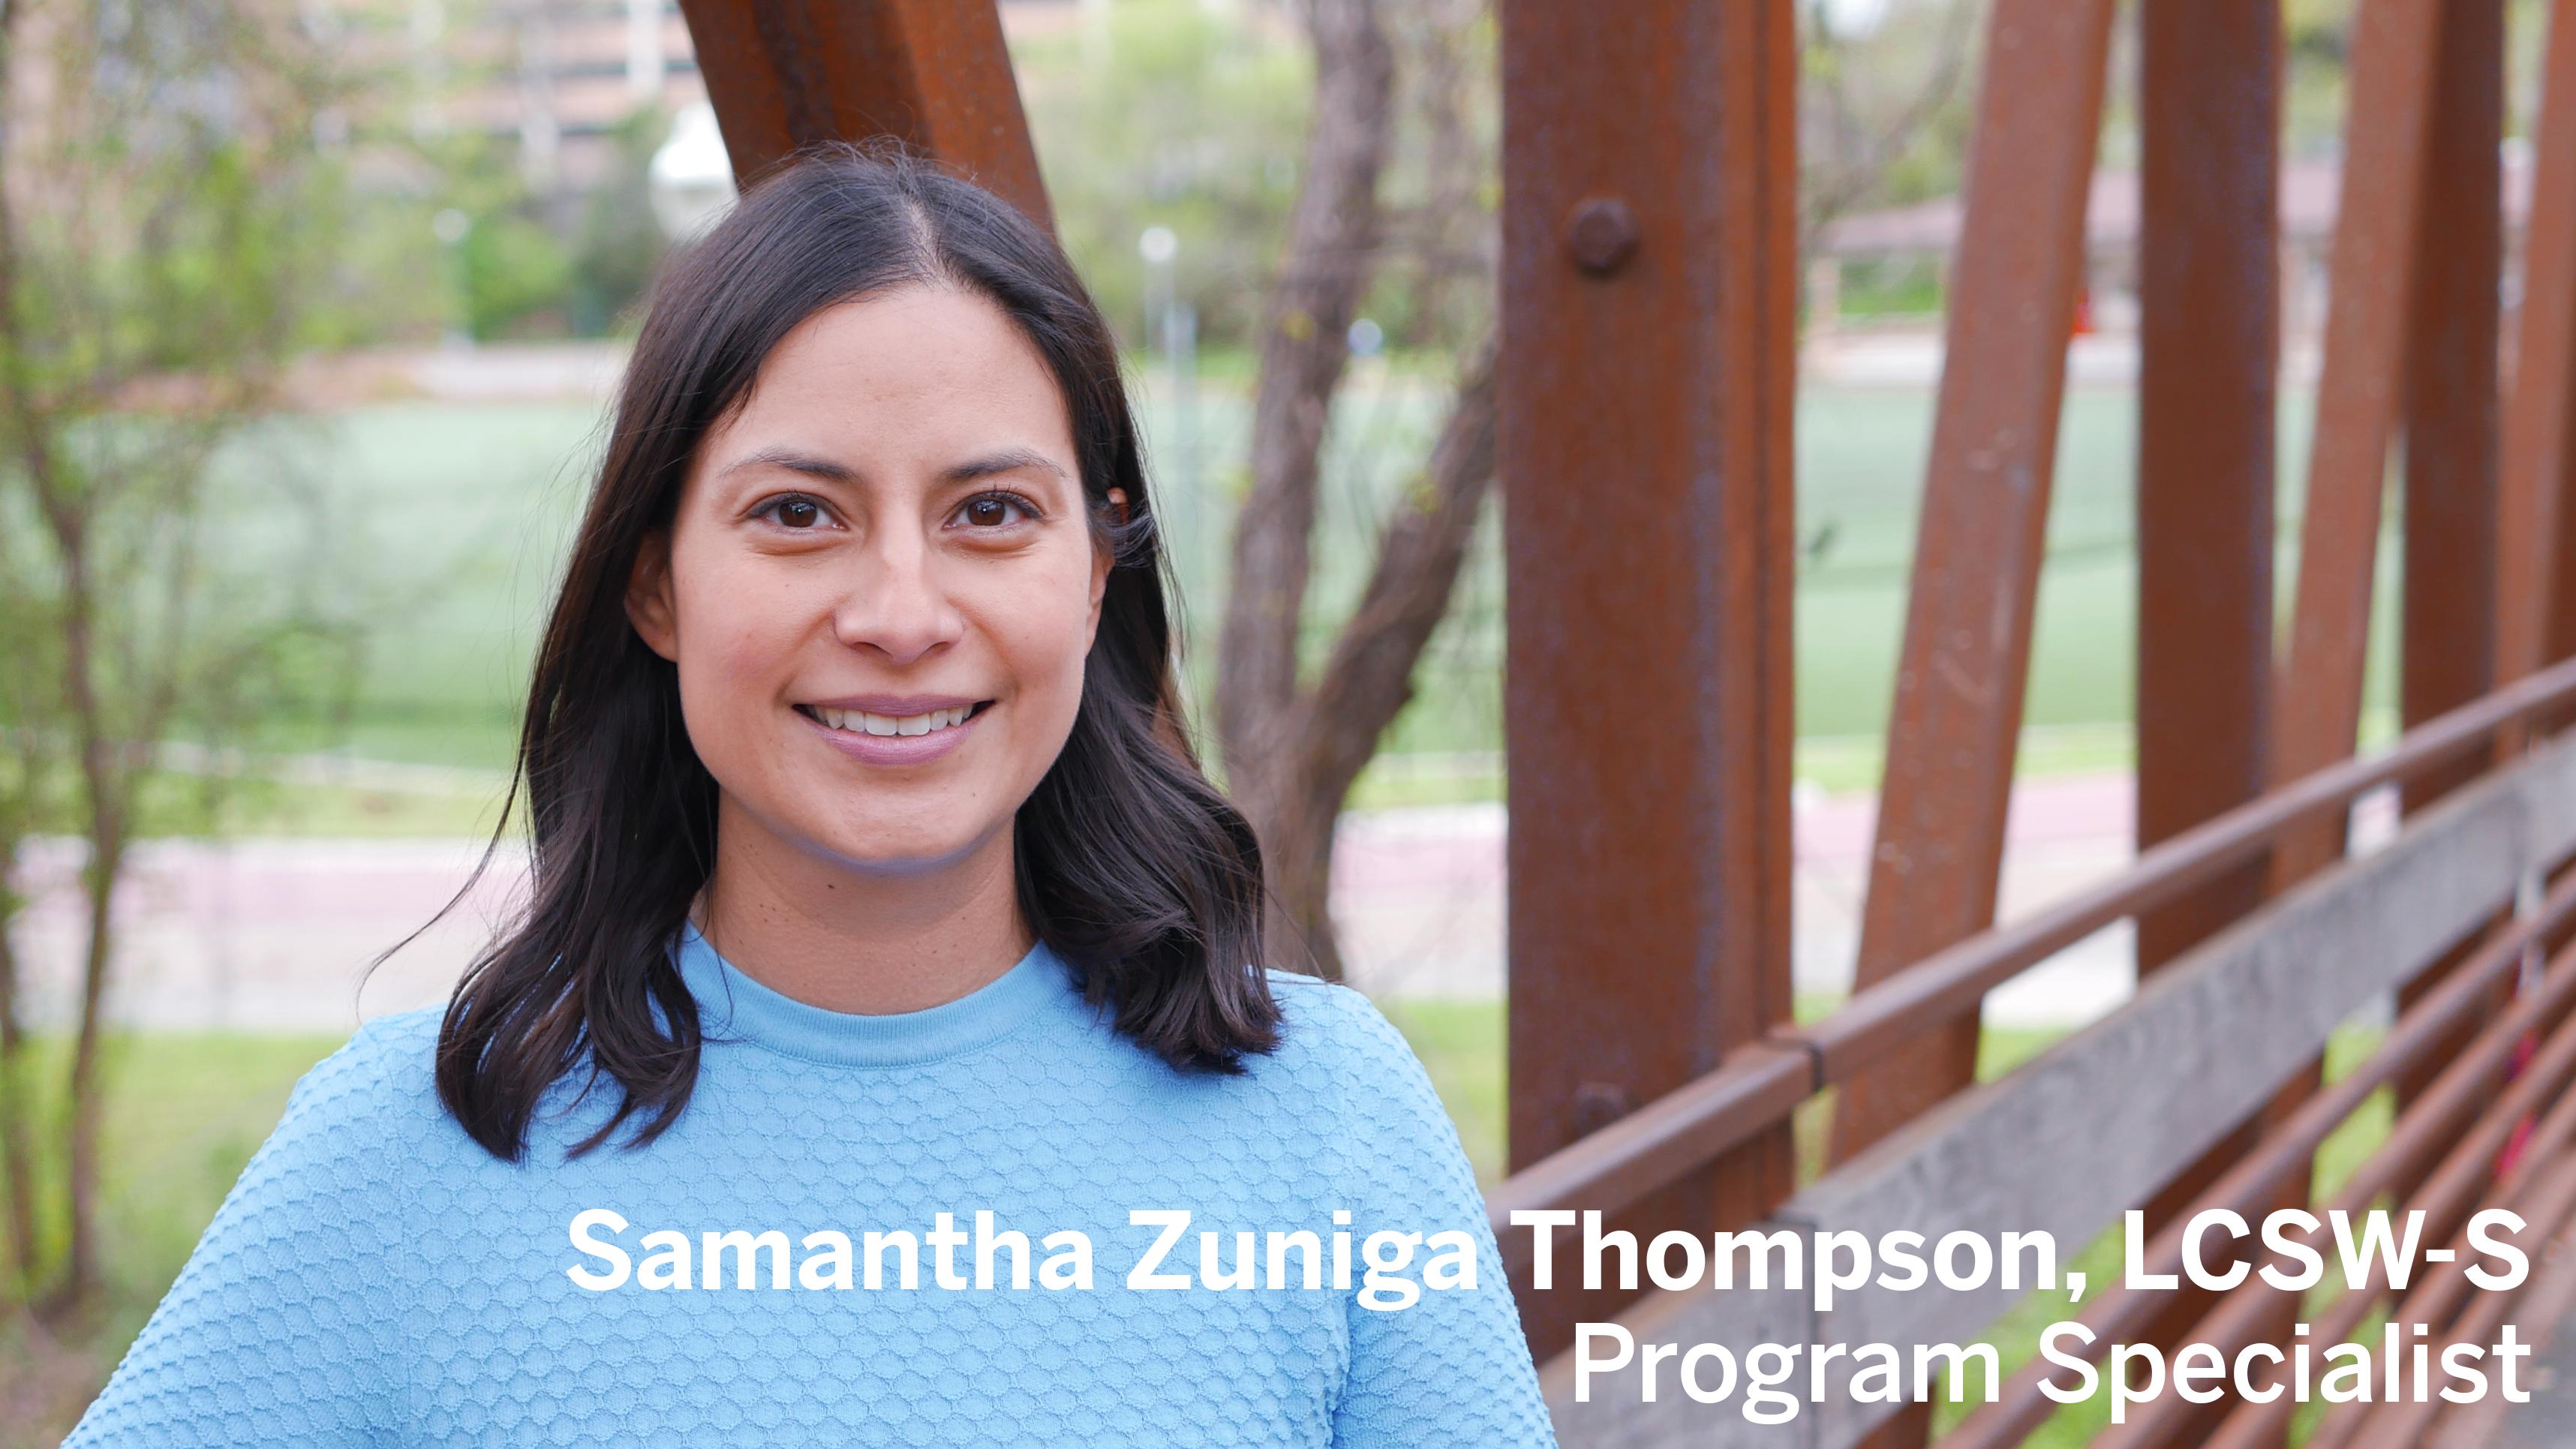 Samantha Zuniga Thompson, LCSW-S